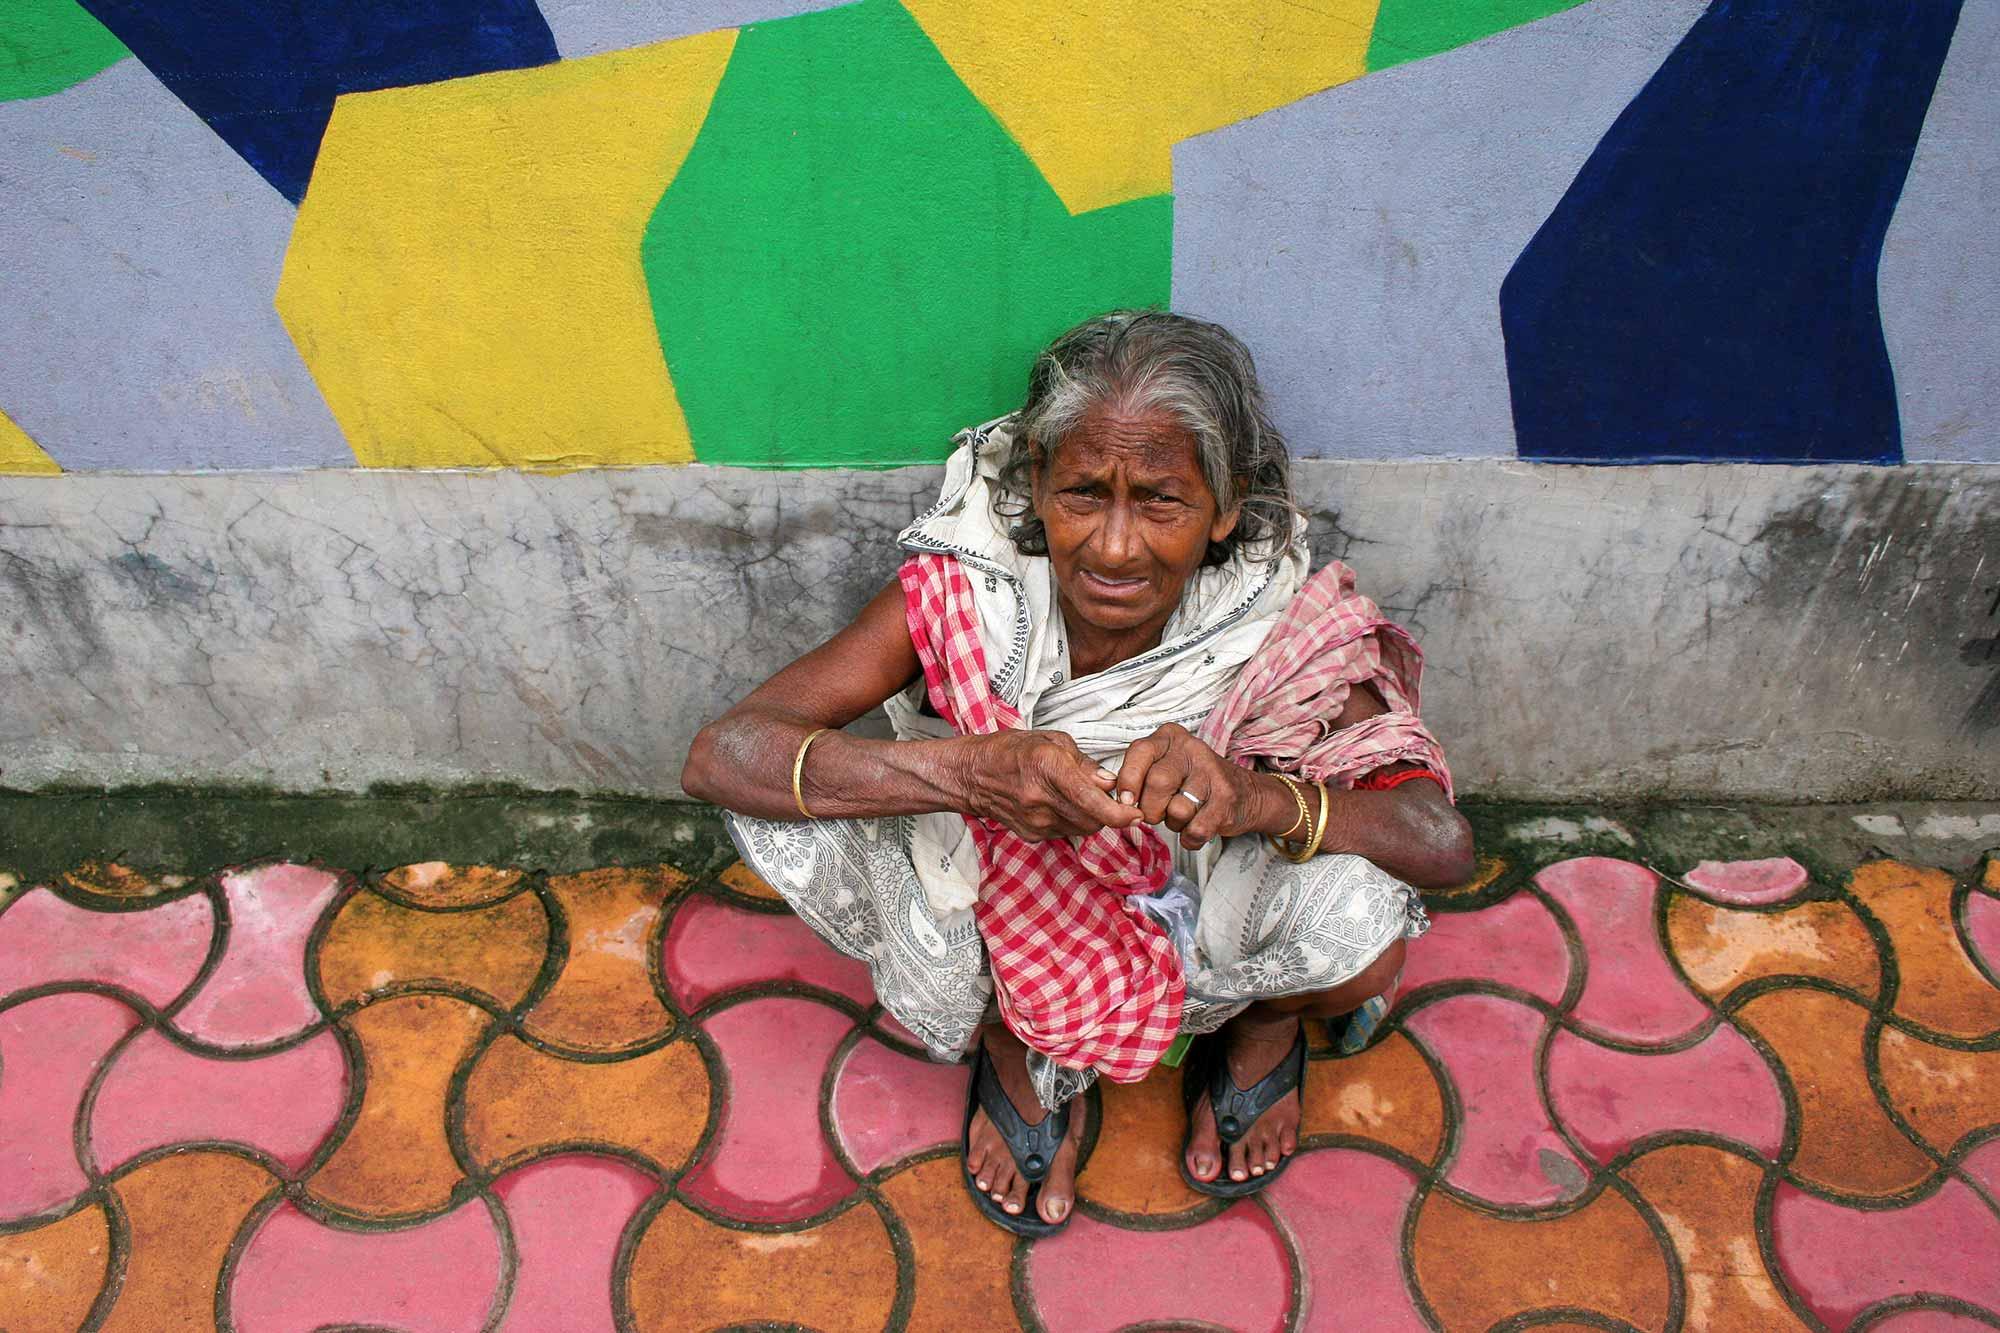 homeless-woman-kolkata-india